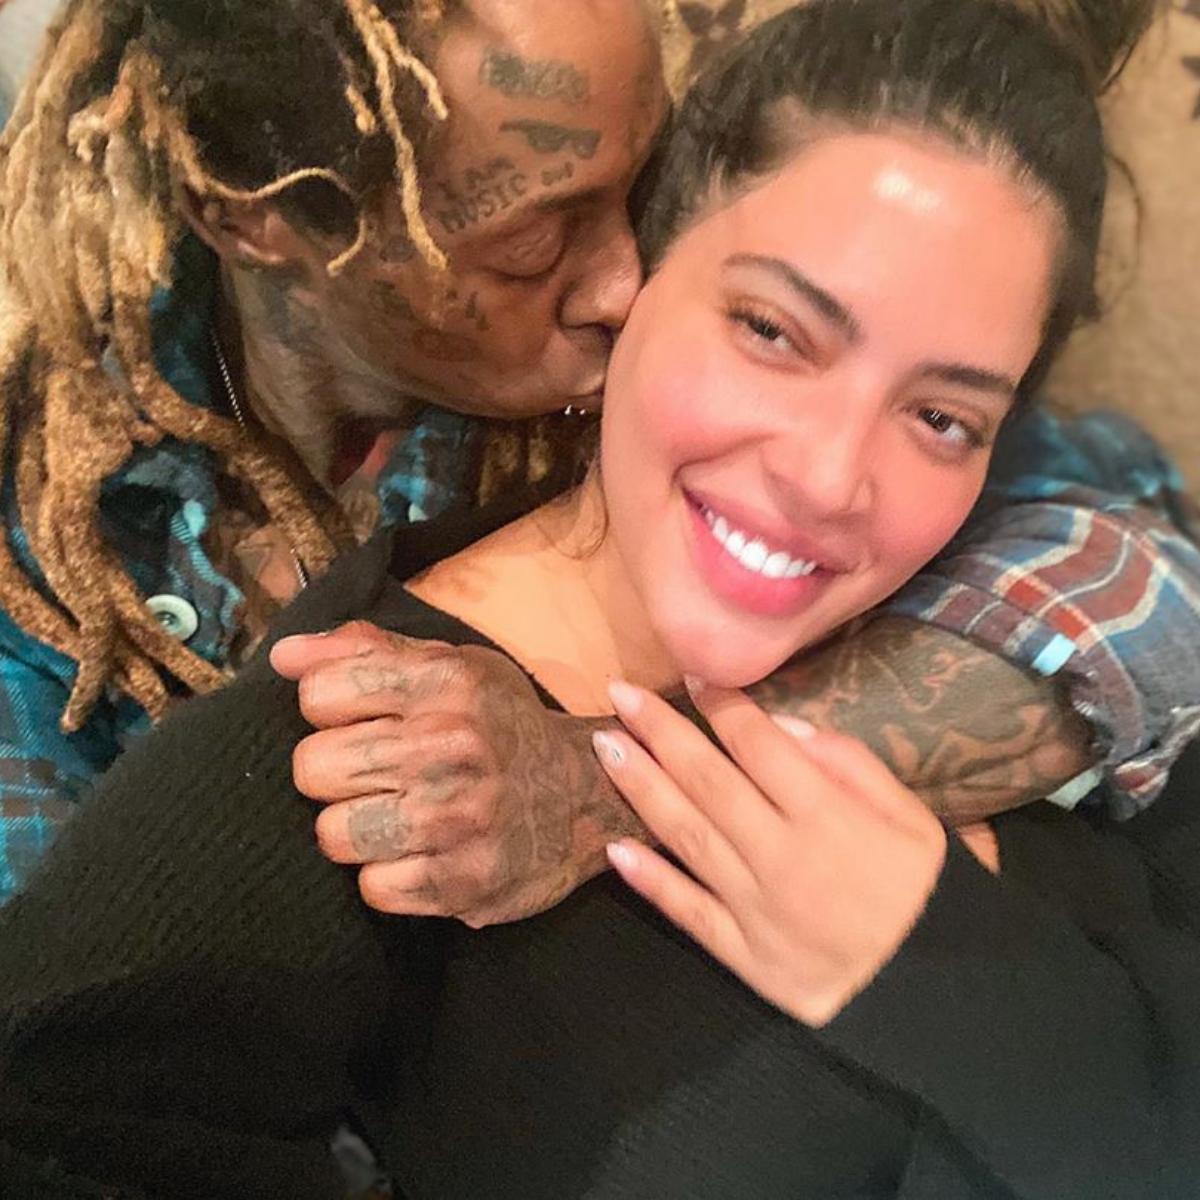 Lil Wayne With Girlfriend Denise Bidot